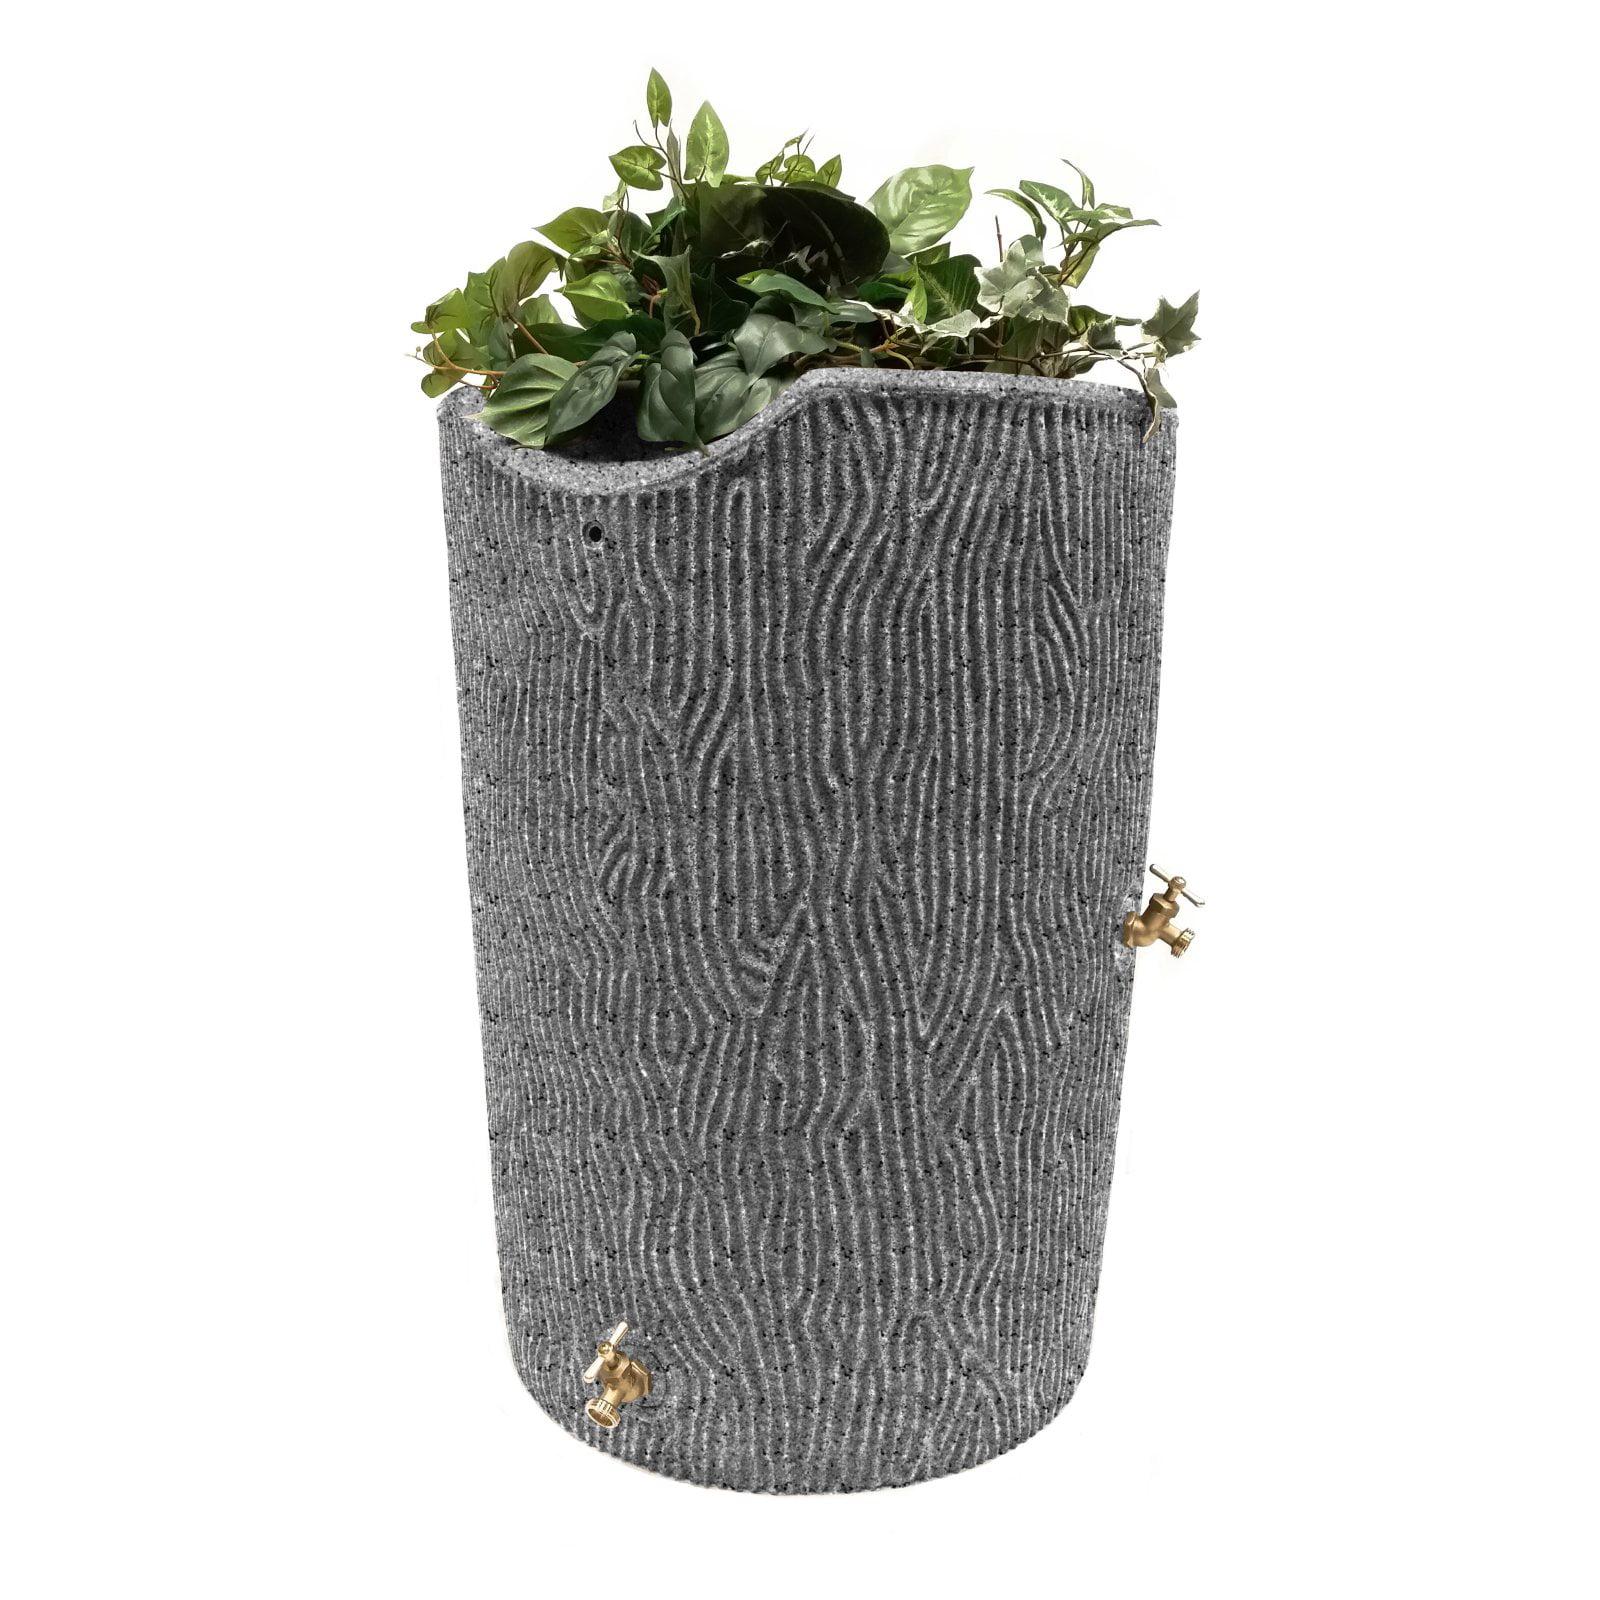 Impressions 50-Gallon Bark Rain Saver, Light Granite